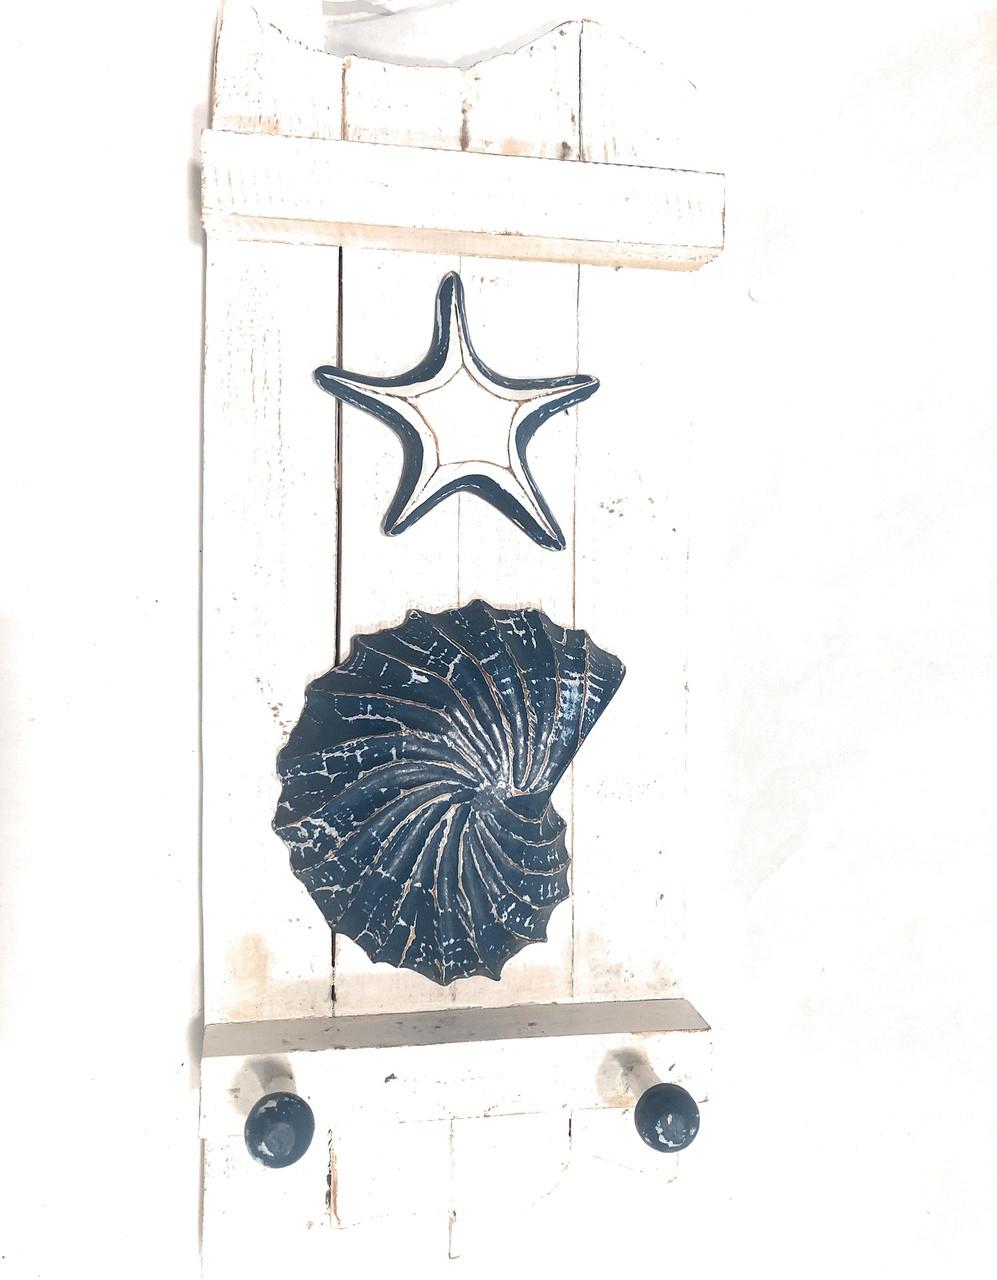 Hanger On Slats 20 W Fish Starfish Nautical Decor Accents Snd2500950